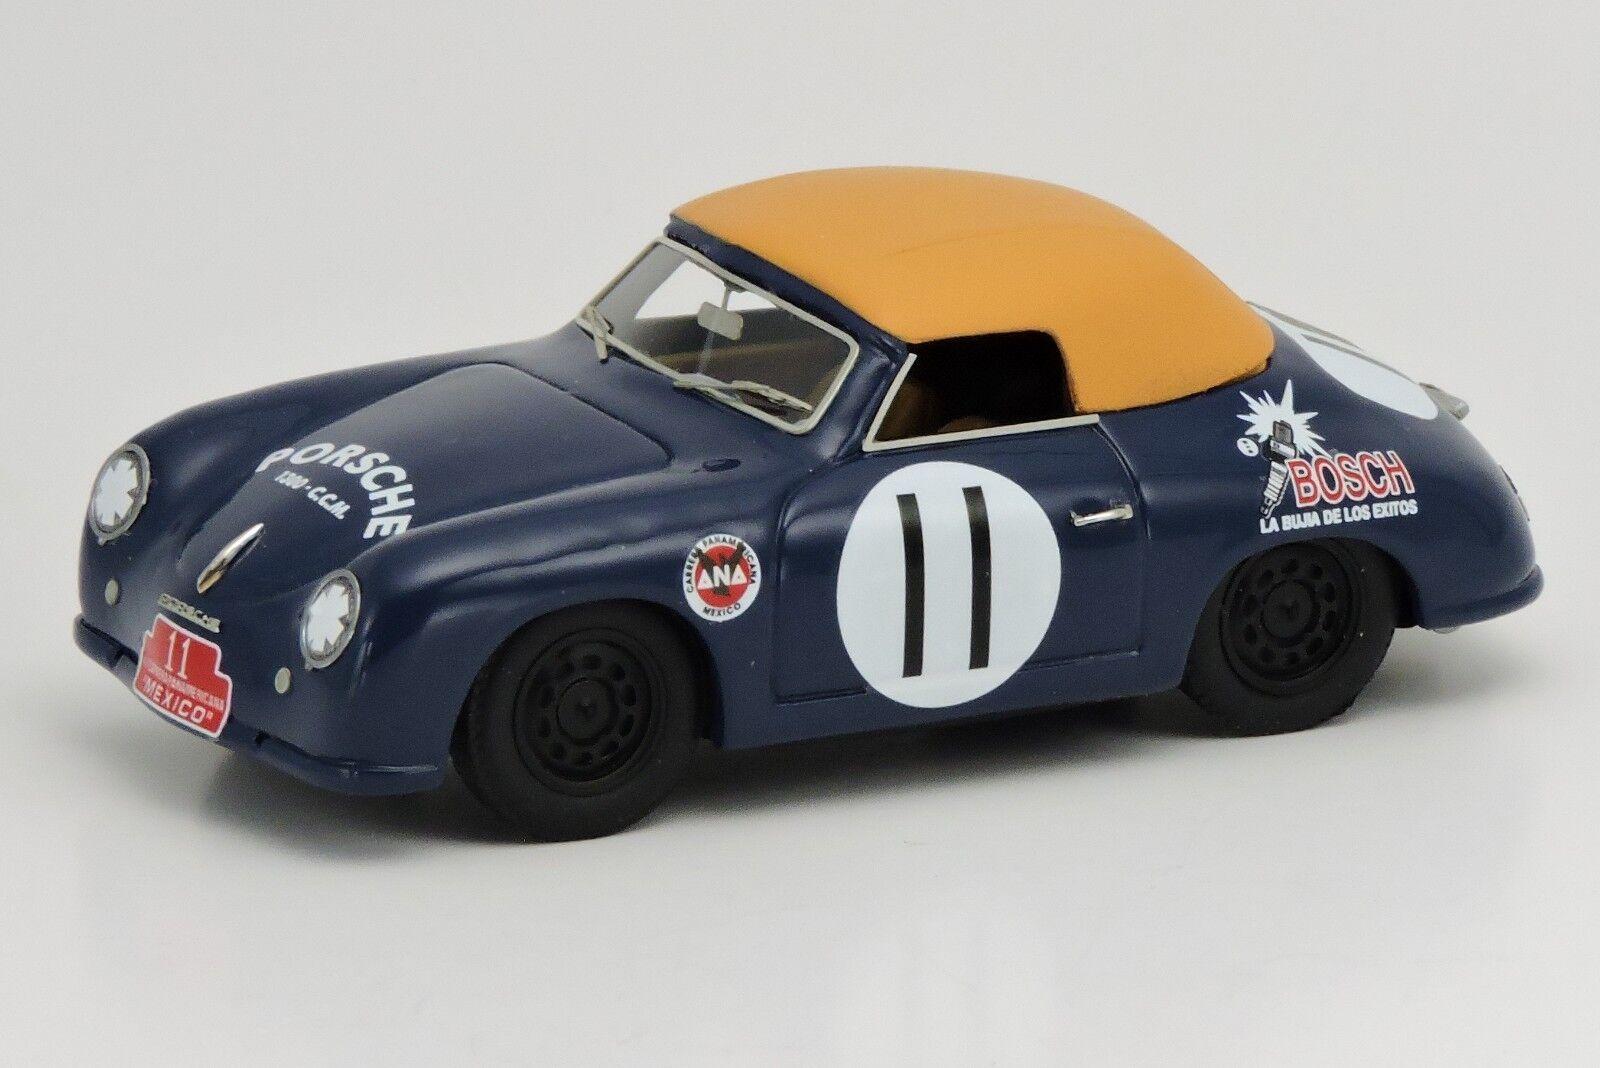 kit Porsche 356 A Spider  11 Carrera Panamericana 1952 - Arena Models kit 1 43